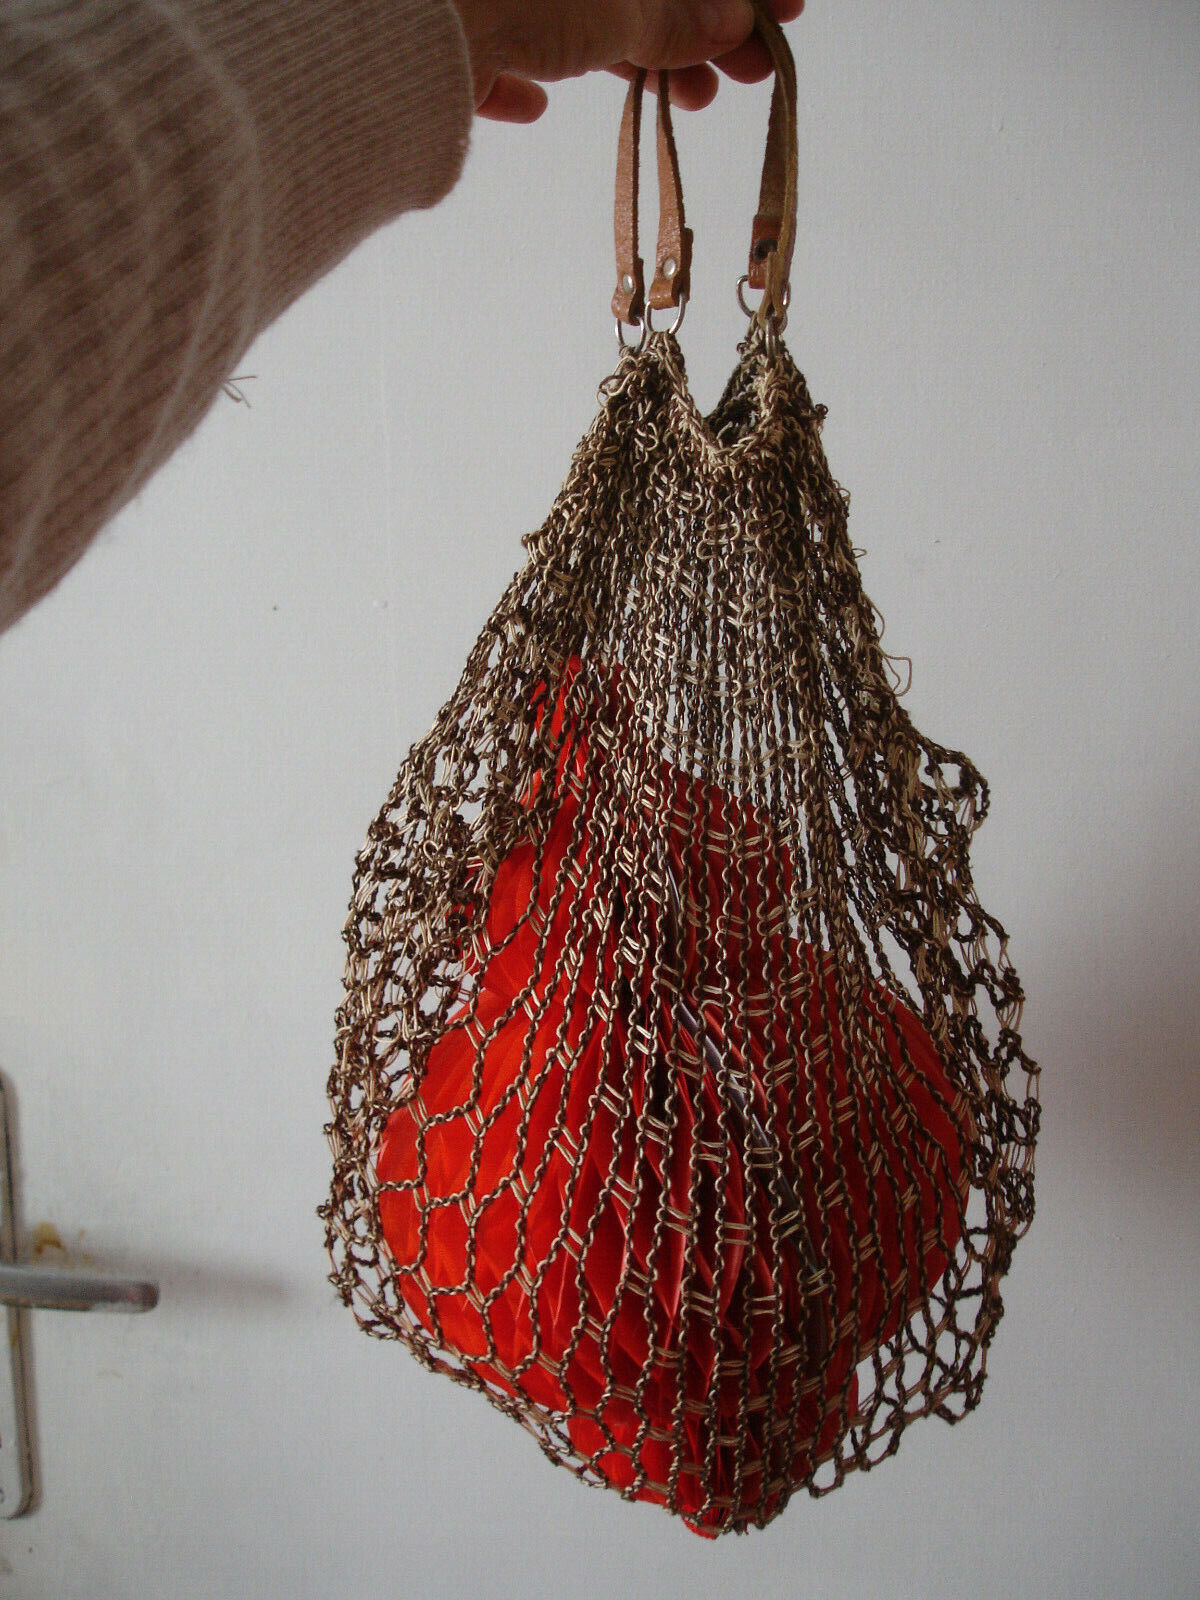 Farmers Fruits Vegetables Rustic Village Bag Crochet Eco Market Shopping Bag Organic Produce Soviet Bag USSR Vintage 60s White String Bag